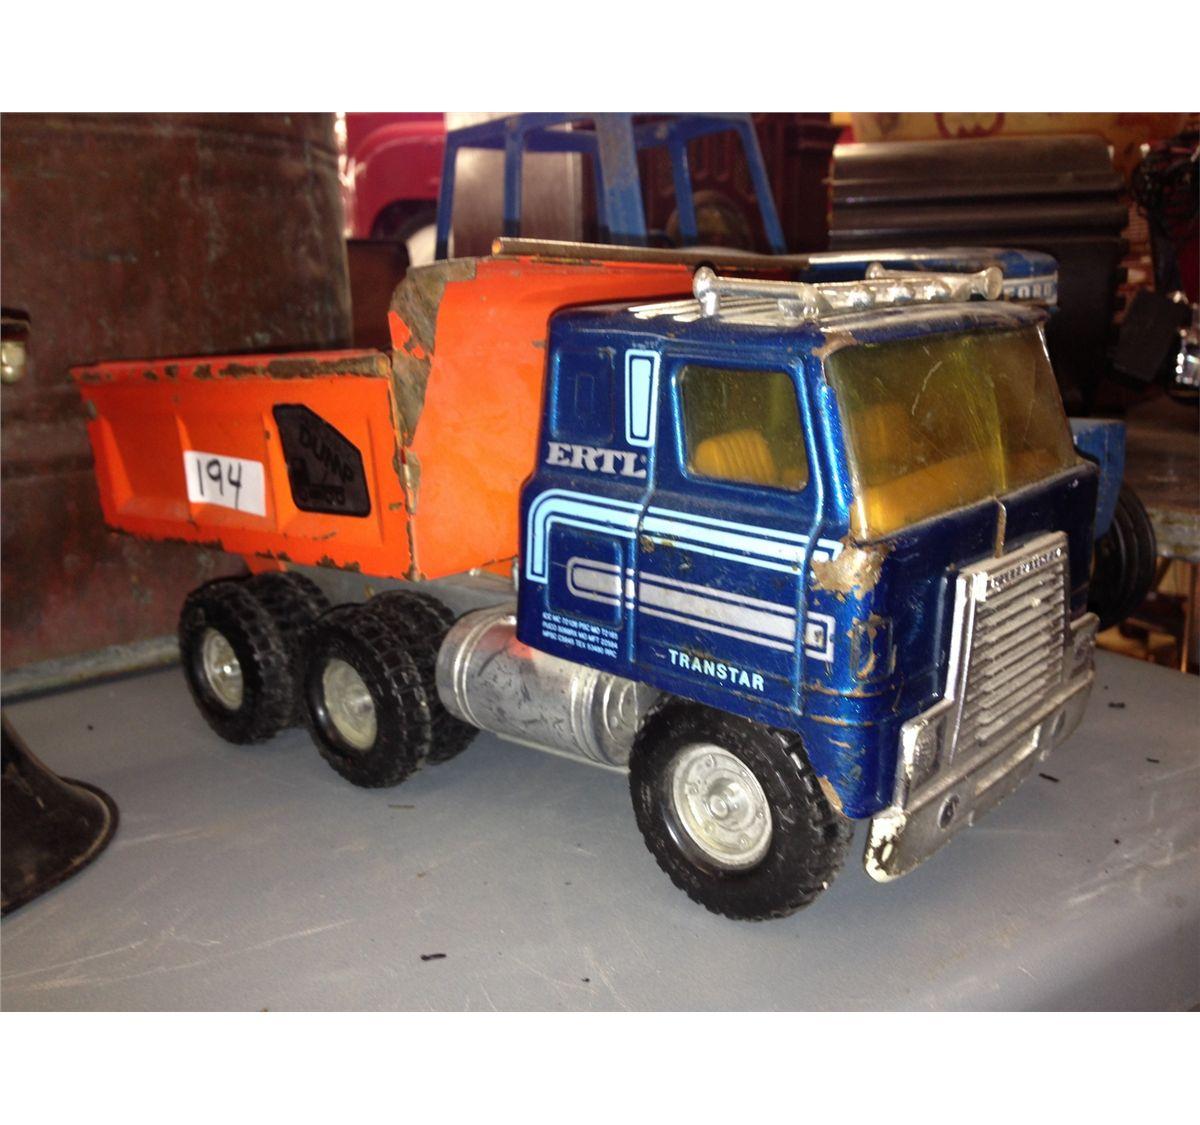 Ertl International Transtar Automatic Dump Truck 0174